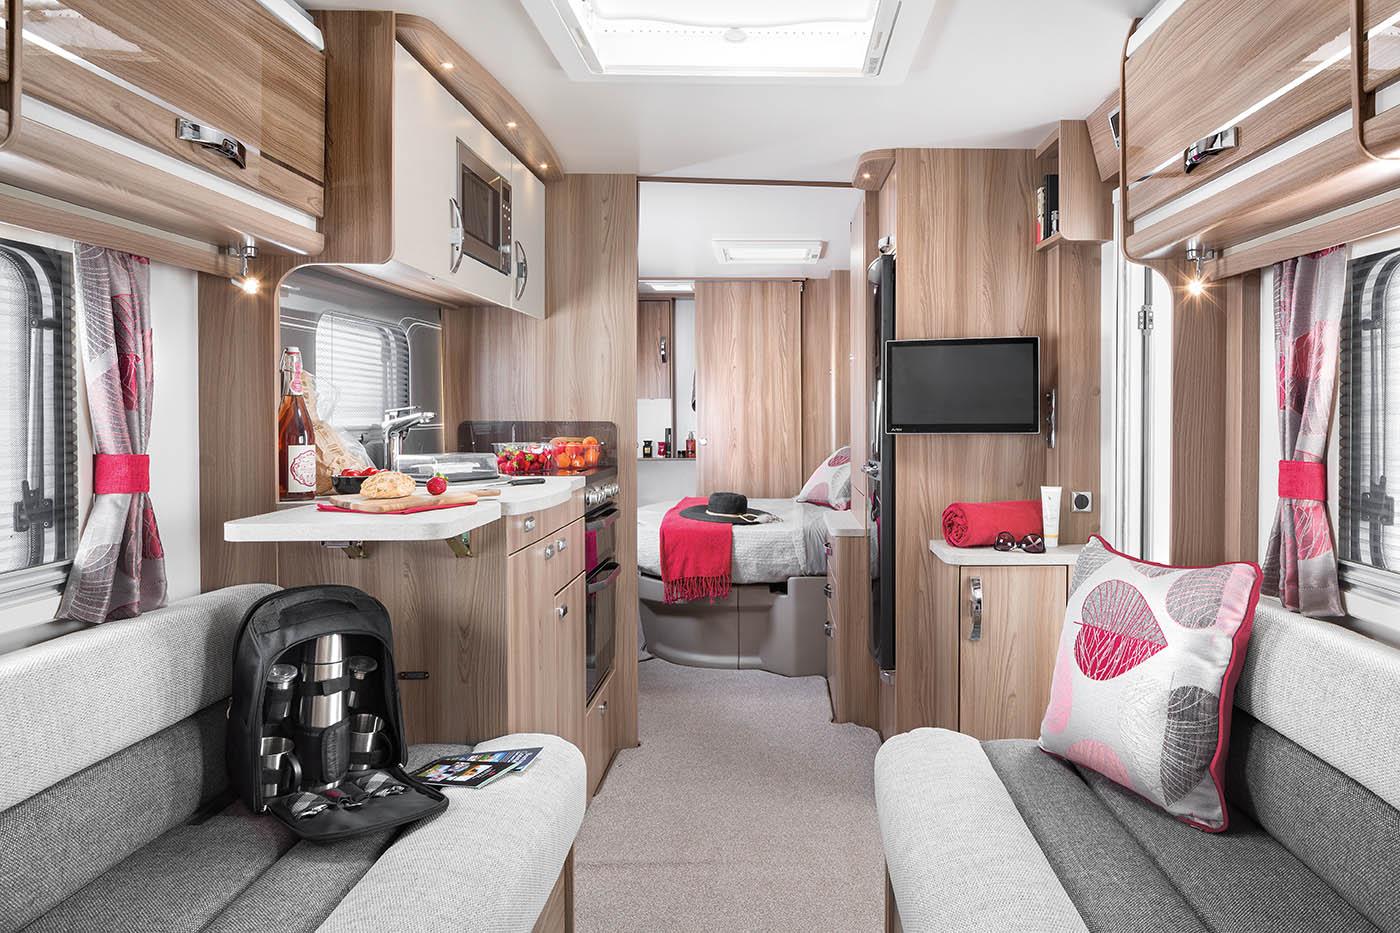 Swift Challenger Ryedale Leisure Caravan Ltd Fuse Box